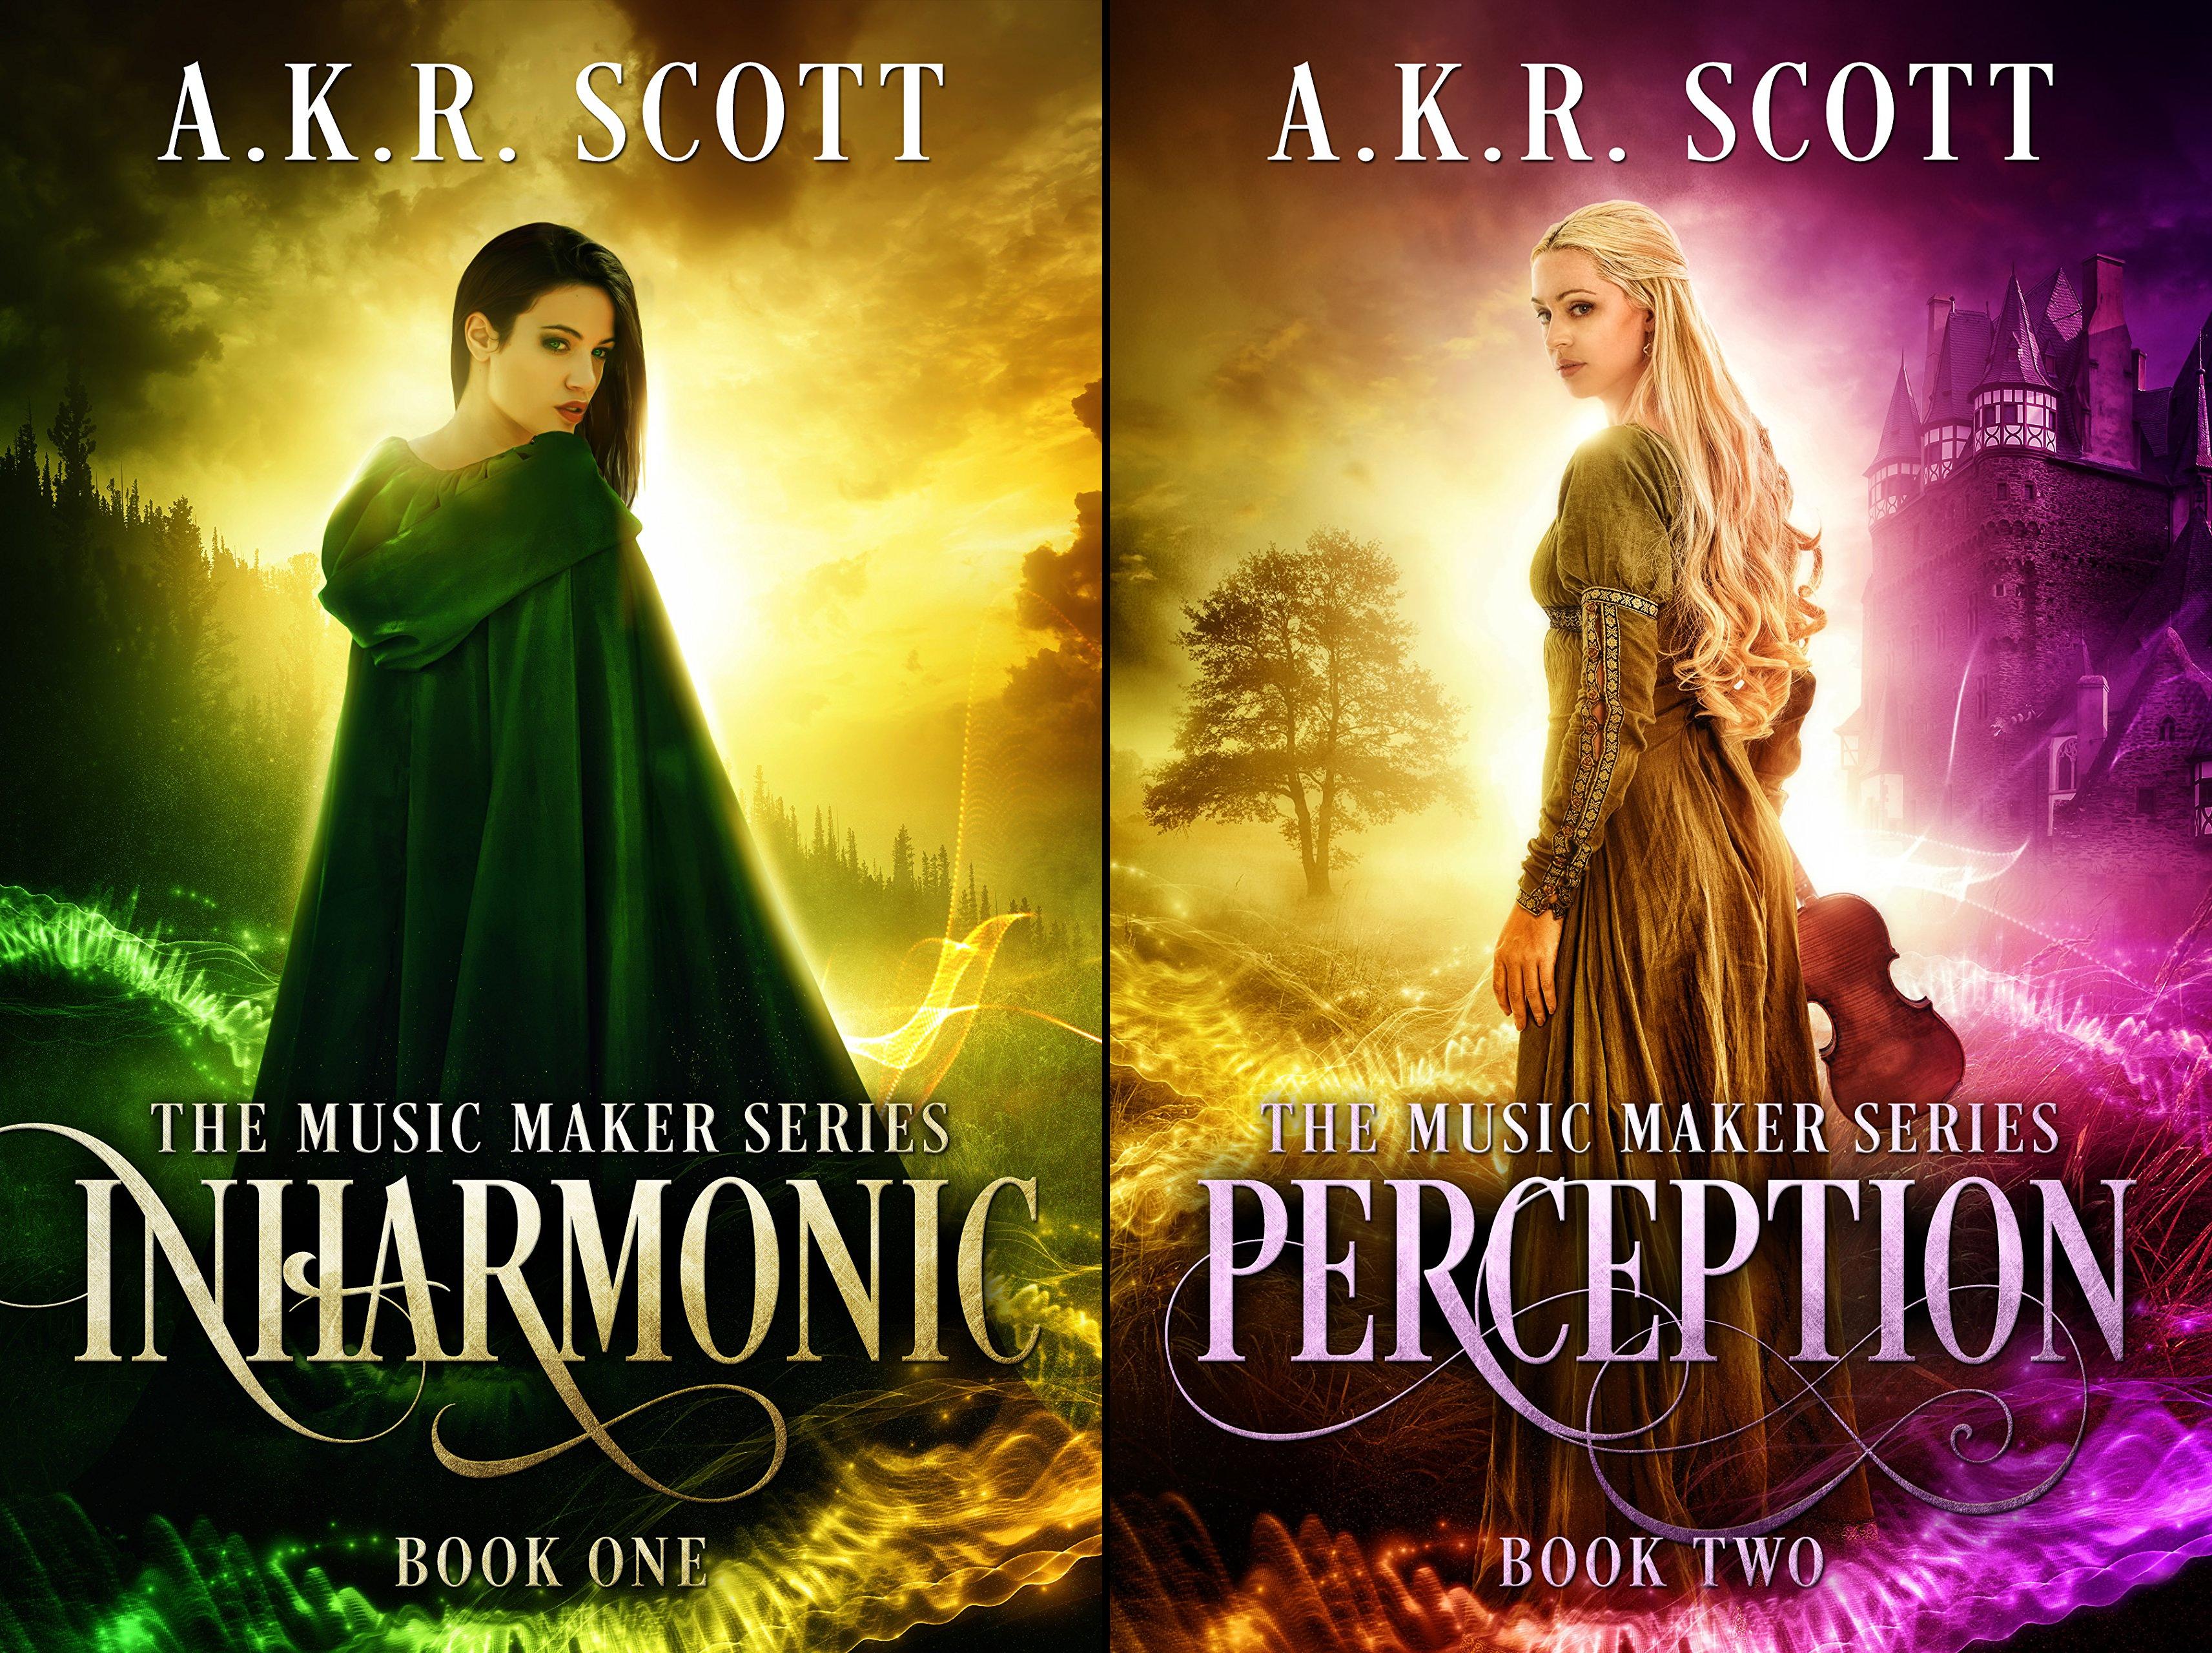 The Music Maker Series (2 Book Series)